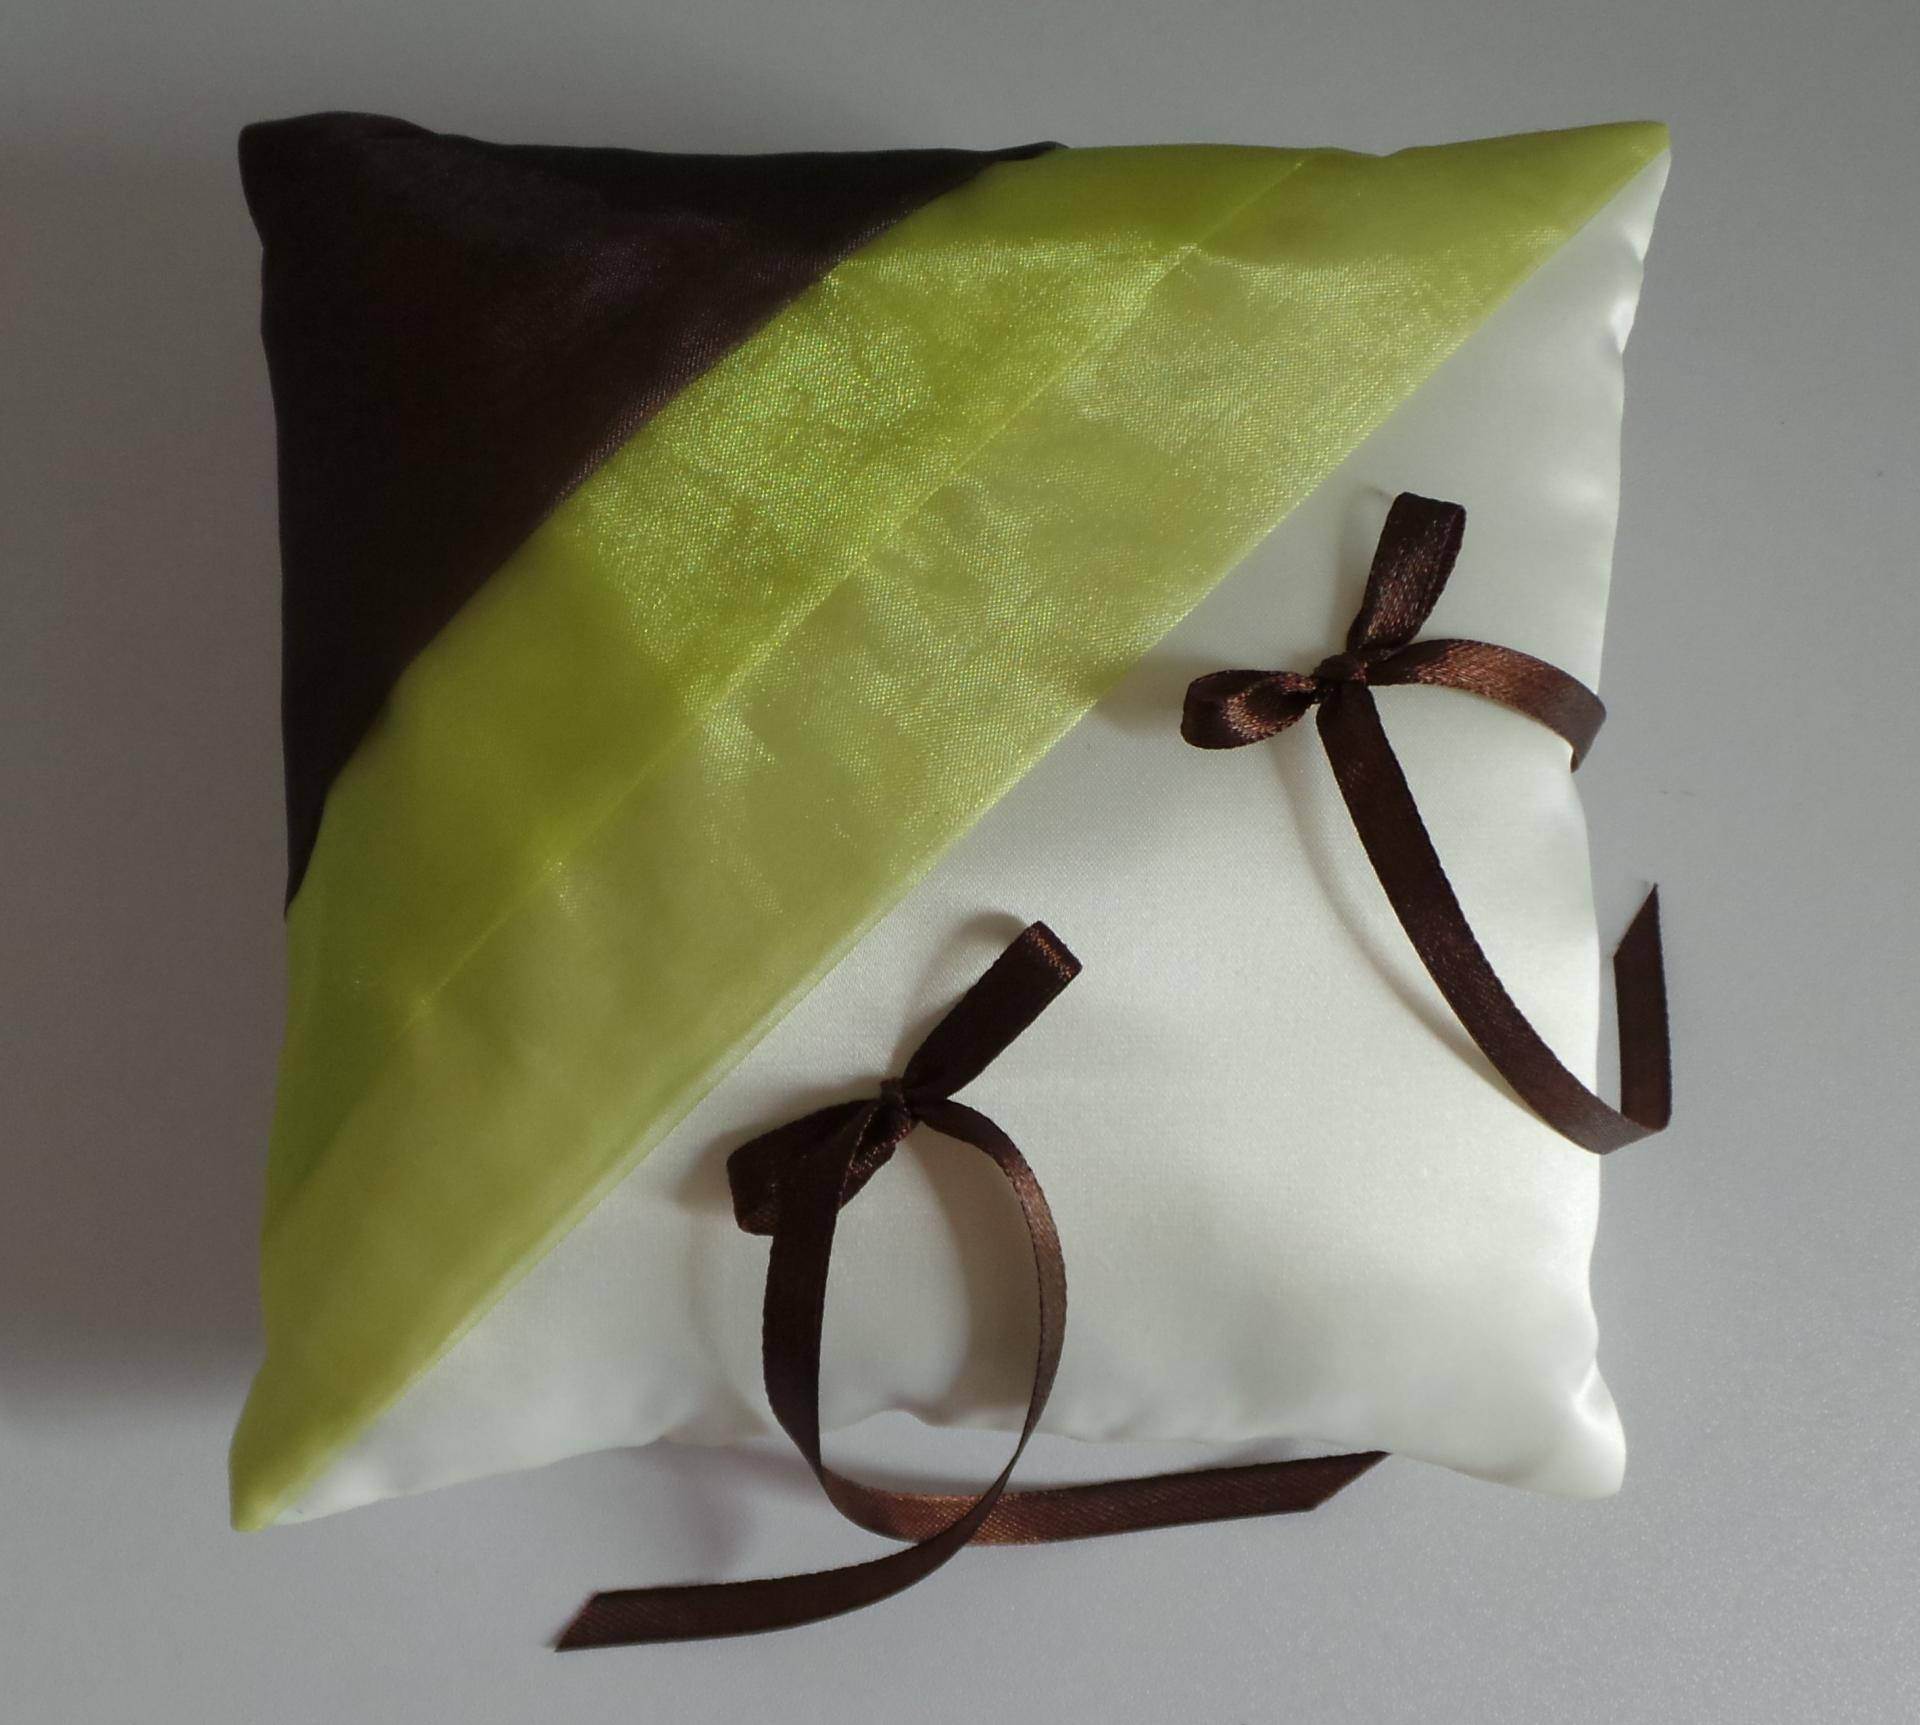 Coussin mariage vert anis marron chocolat ivoire personnalise